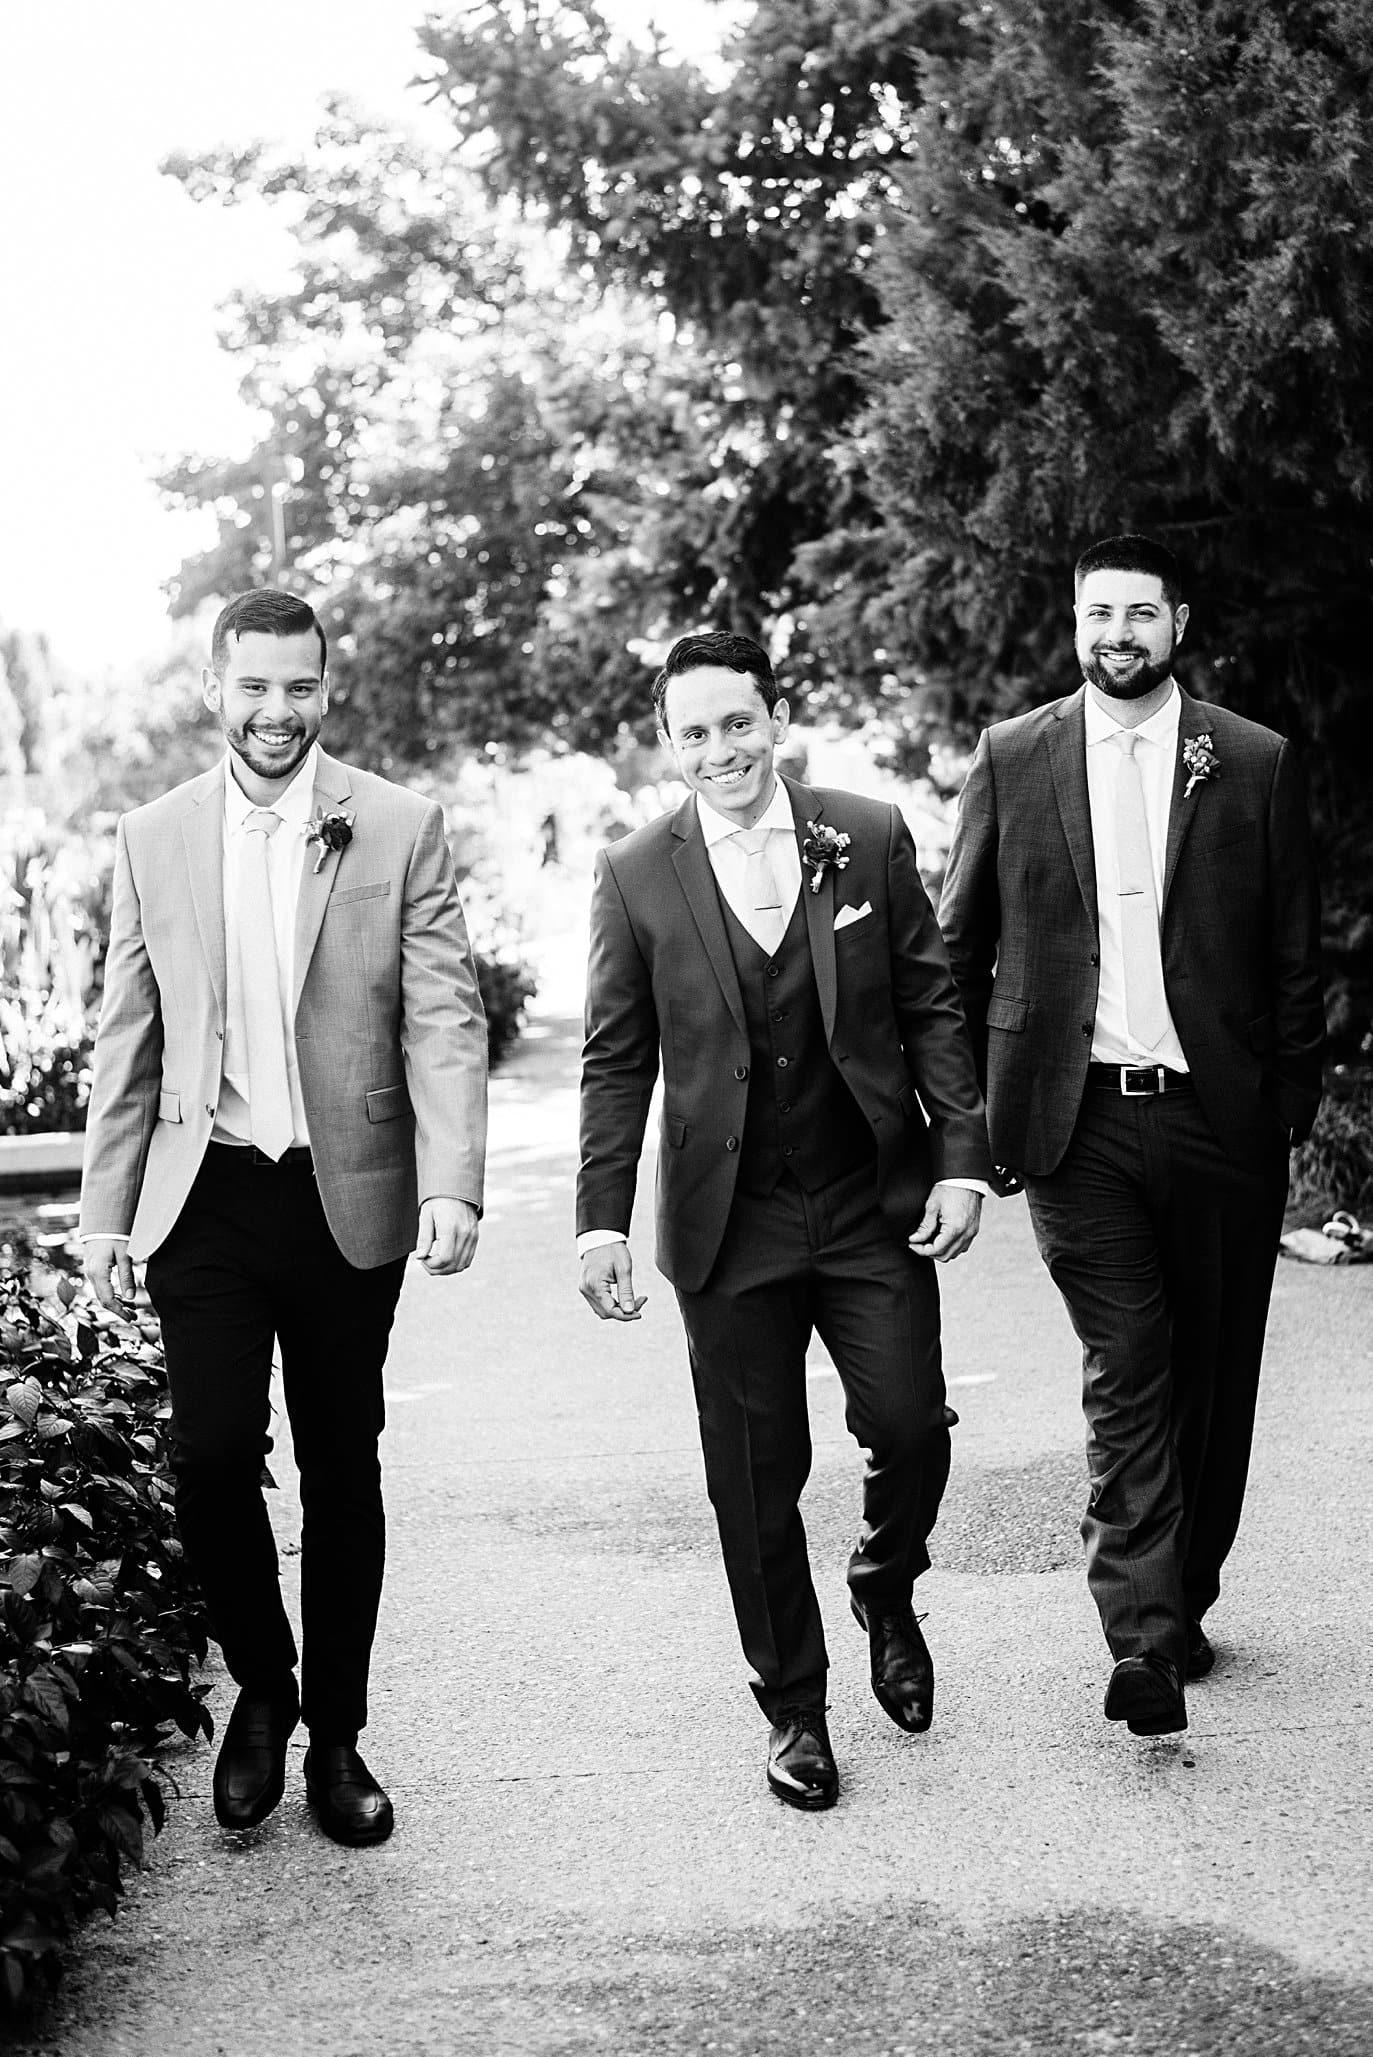 groom and groomsmen walk around gardens before ceremony at Denver Botanic Gardens wedding by Denver wedding photographer Jennie Crate